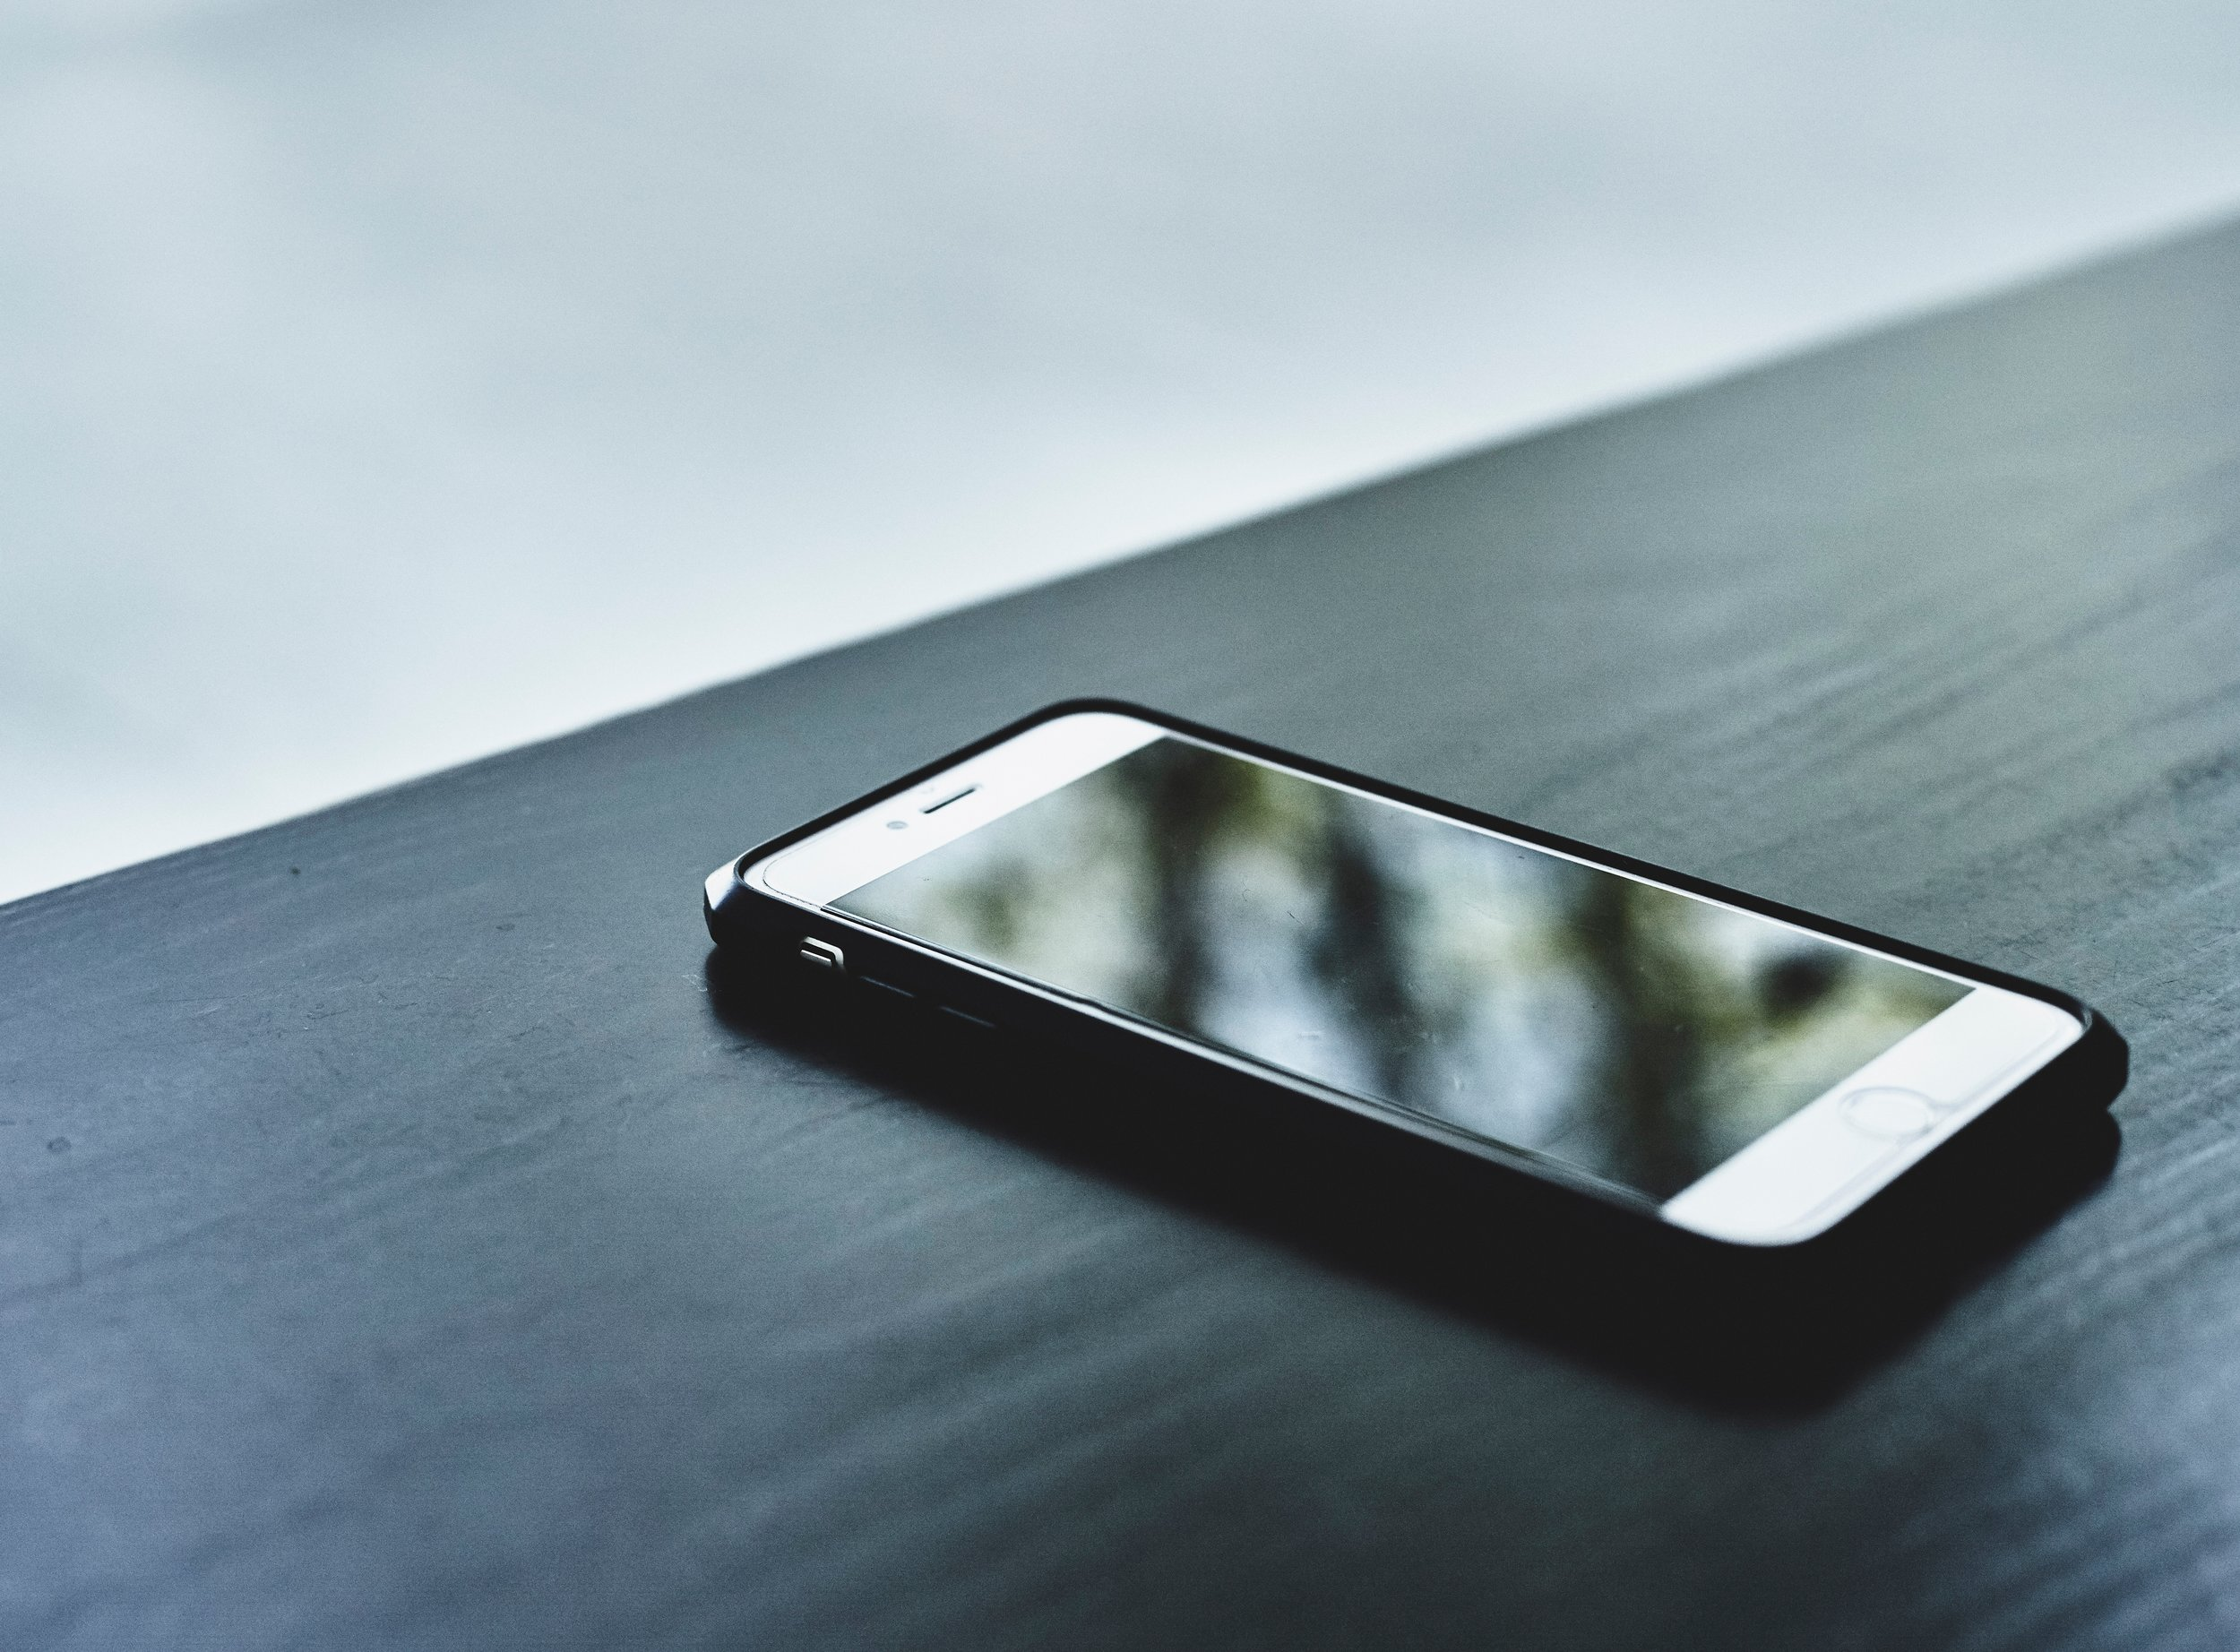 Less phone reliant